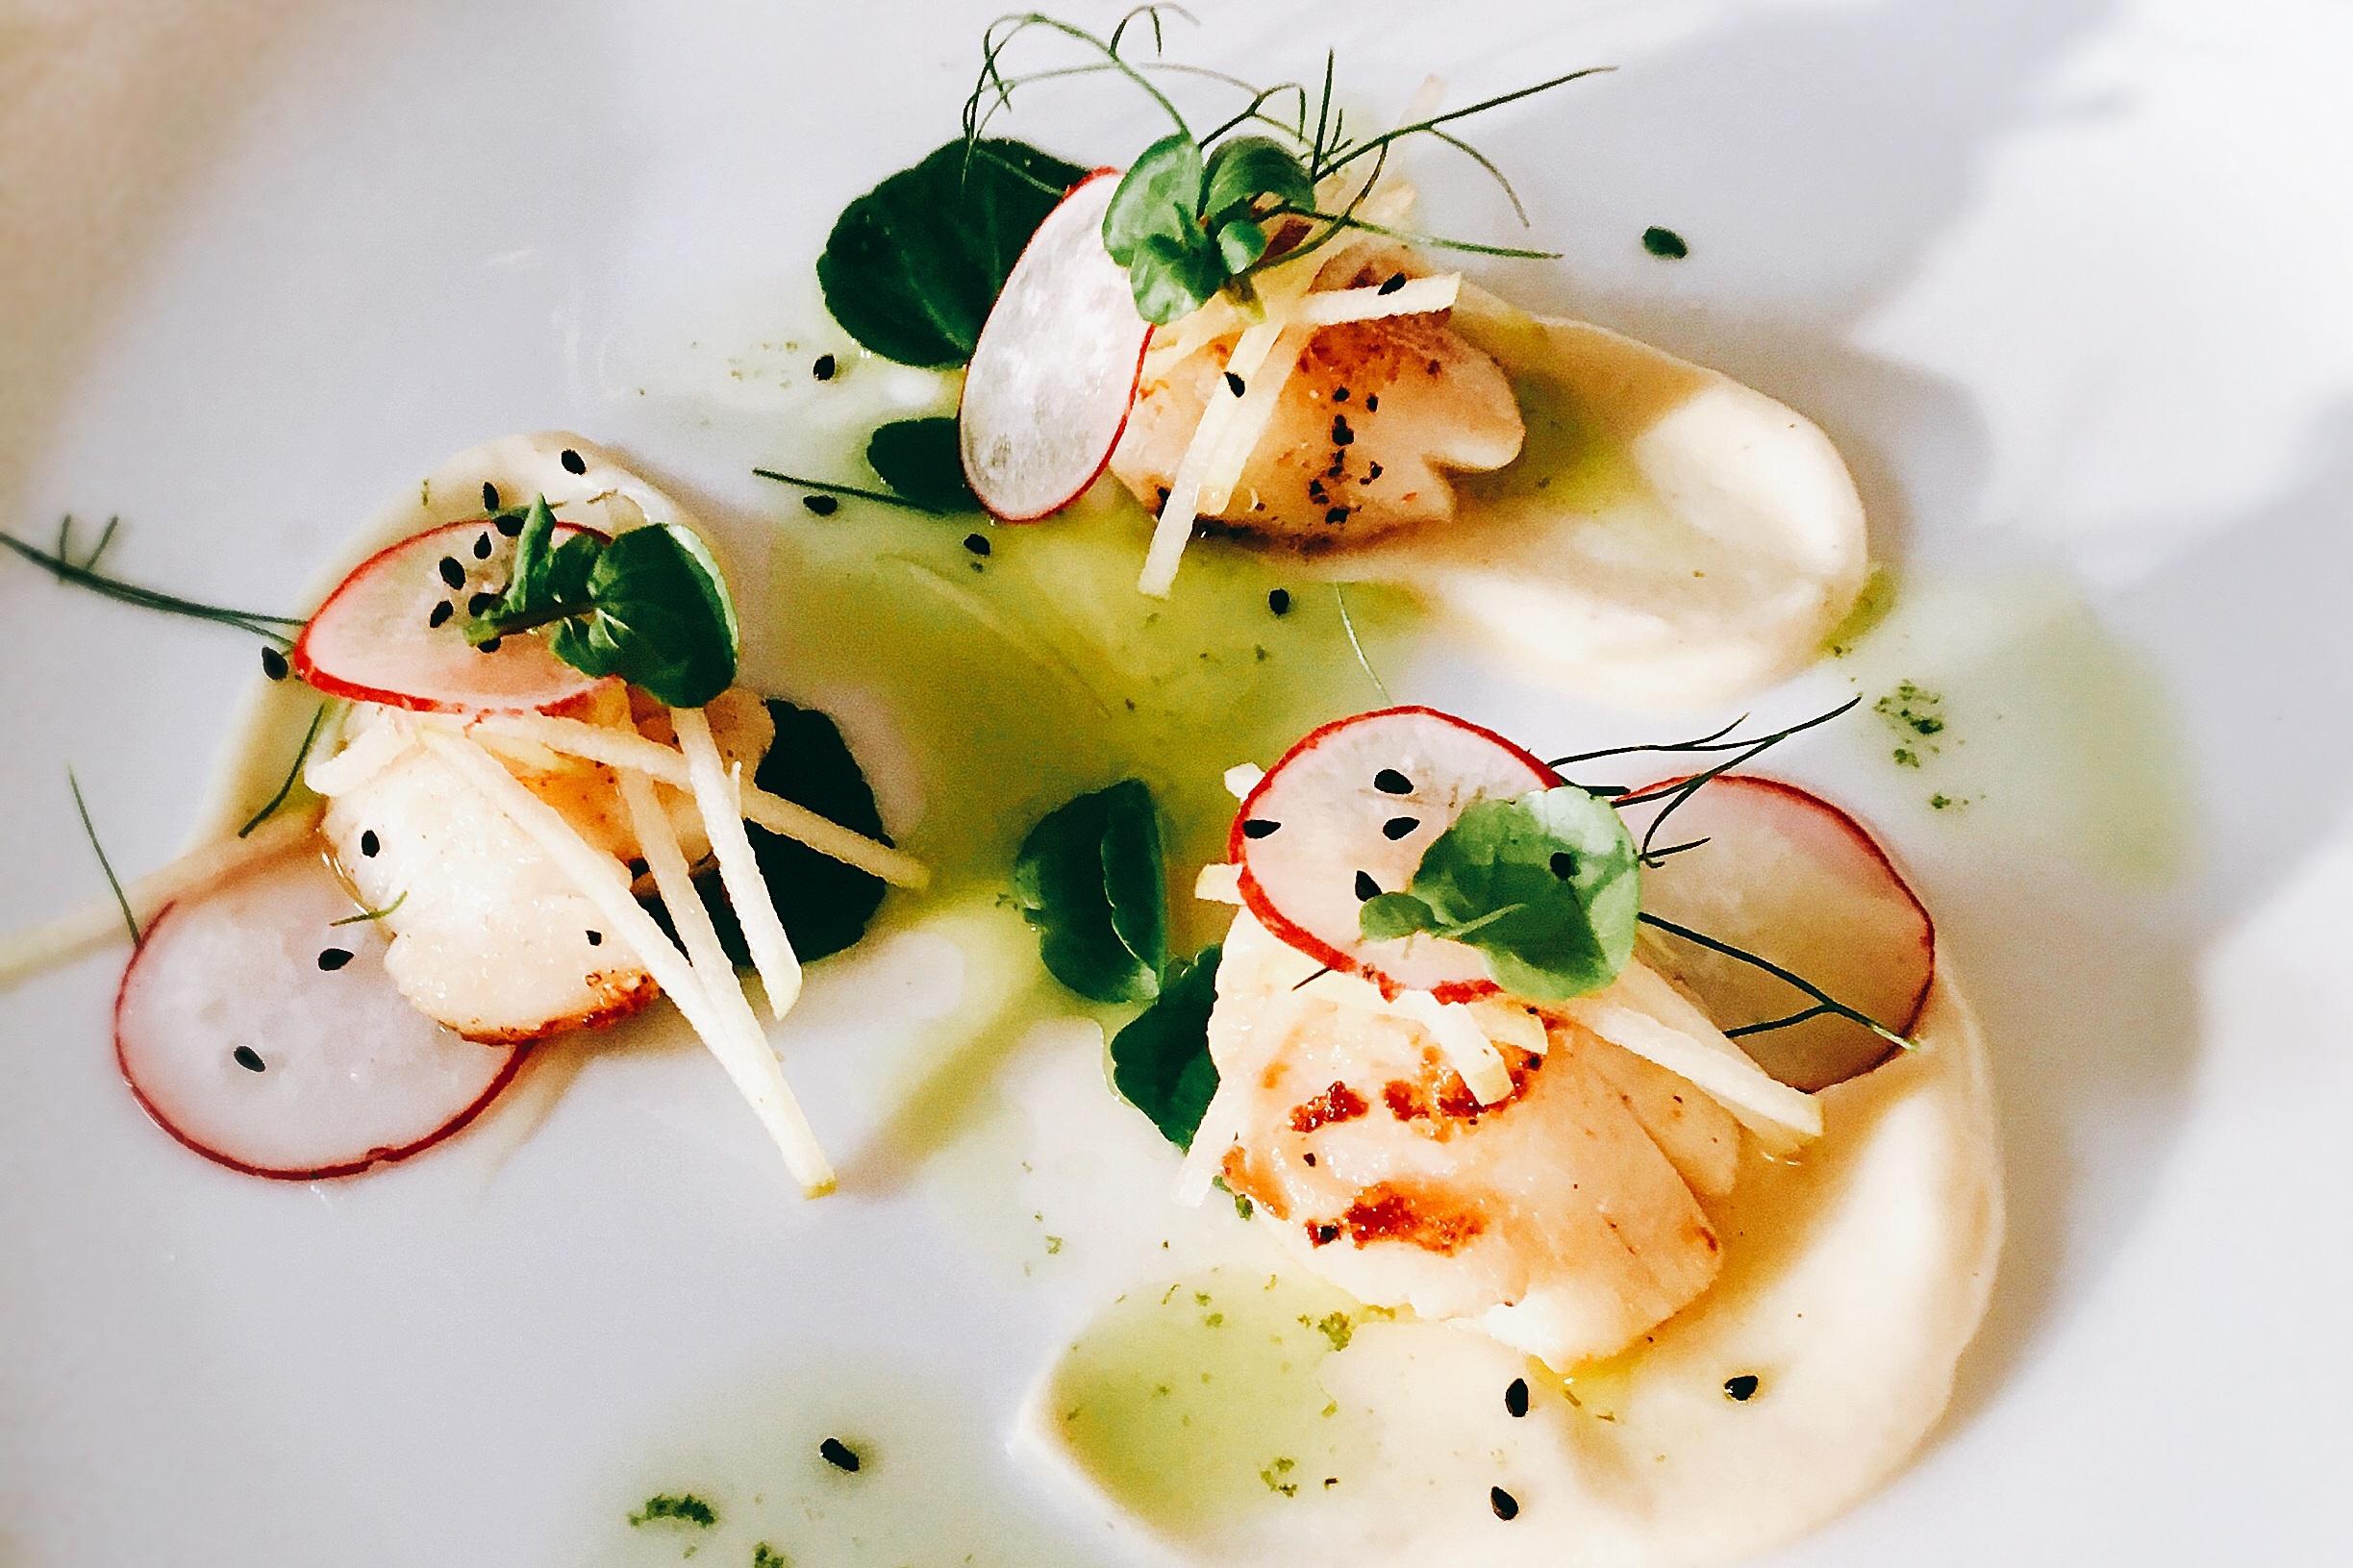 Steve's beautiful scallop dish